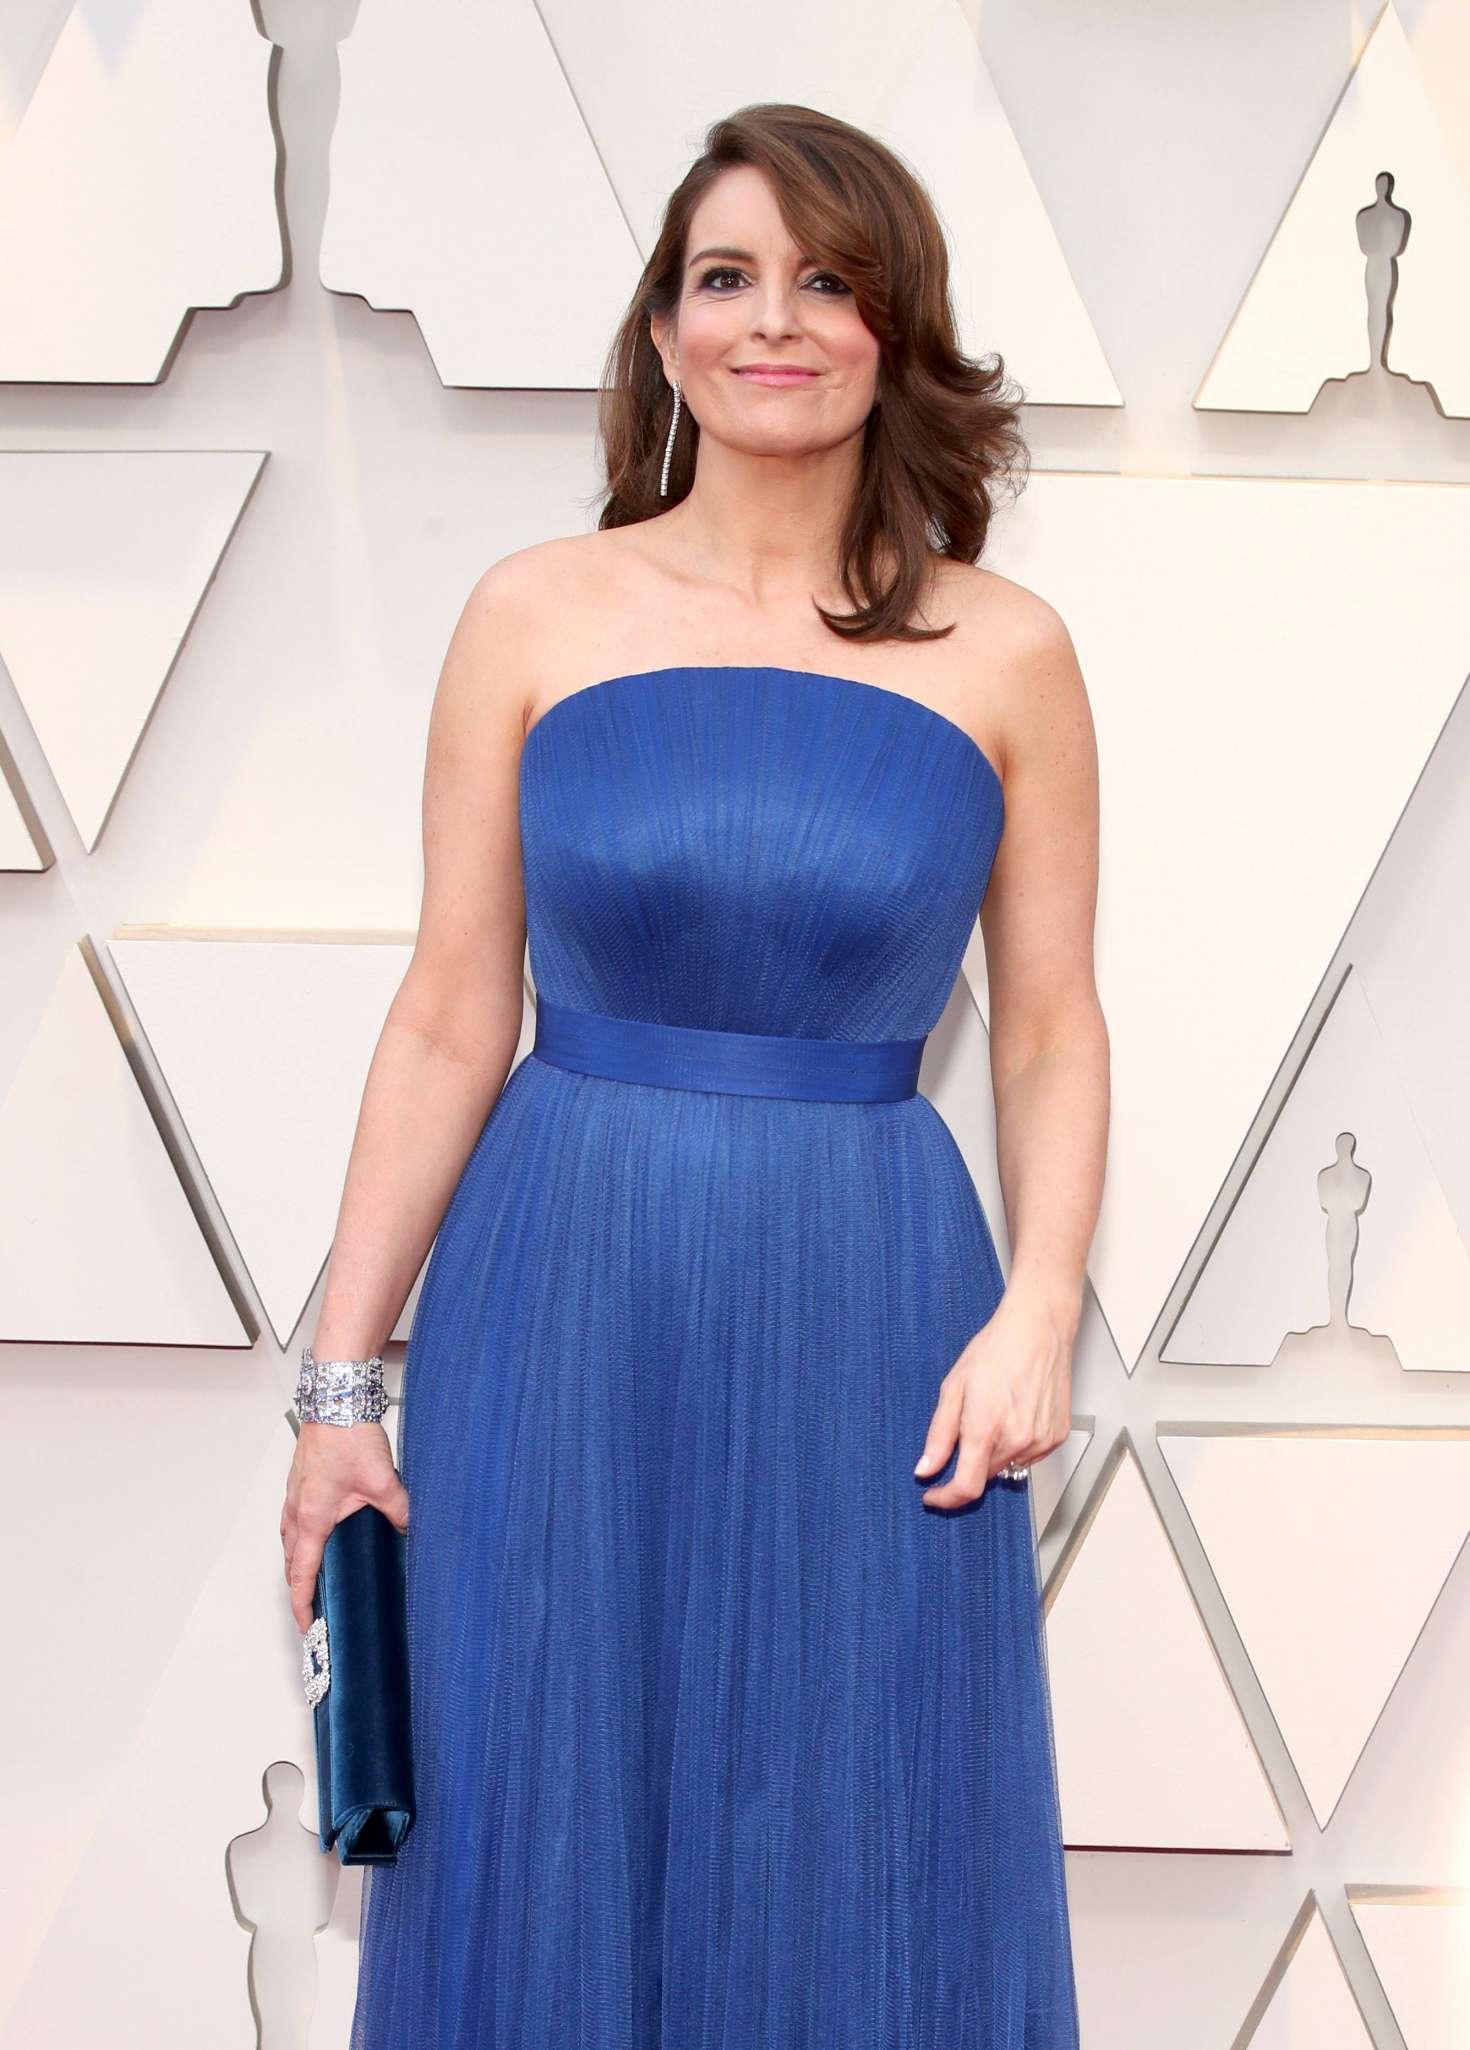 Tina Fey - 2019 Oscars in Los Angeles